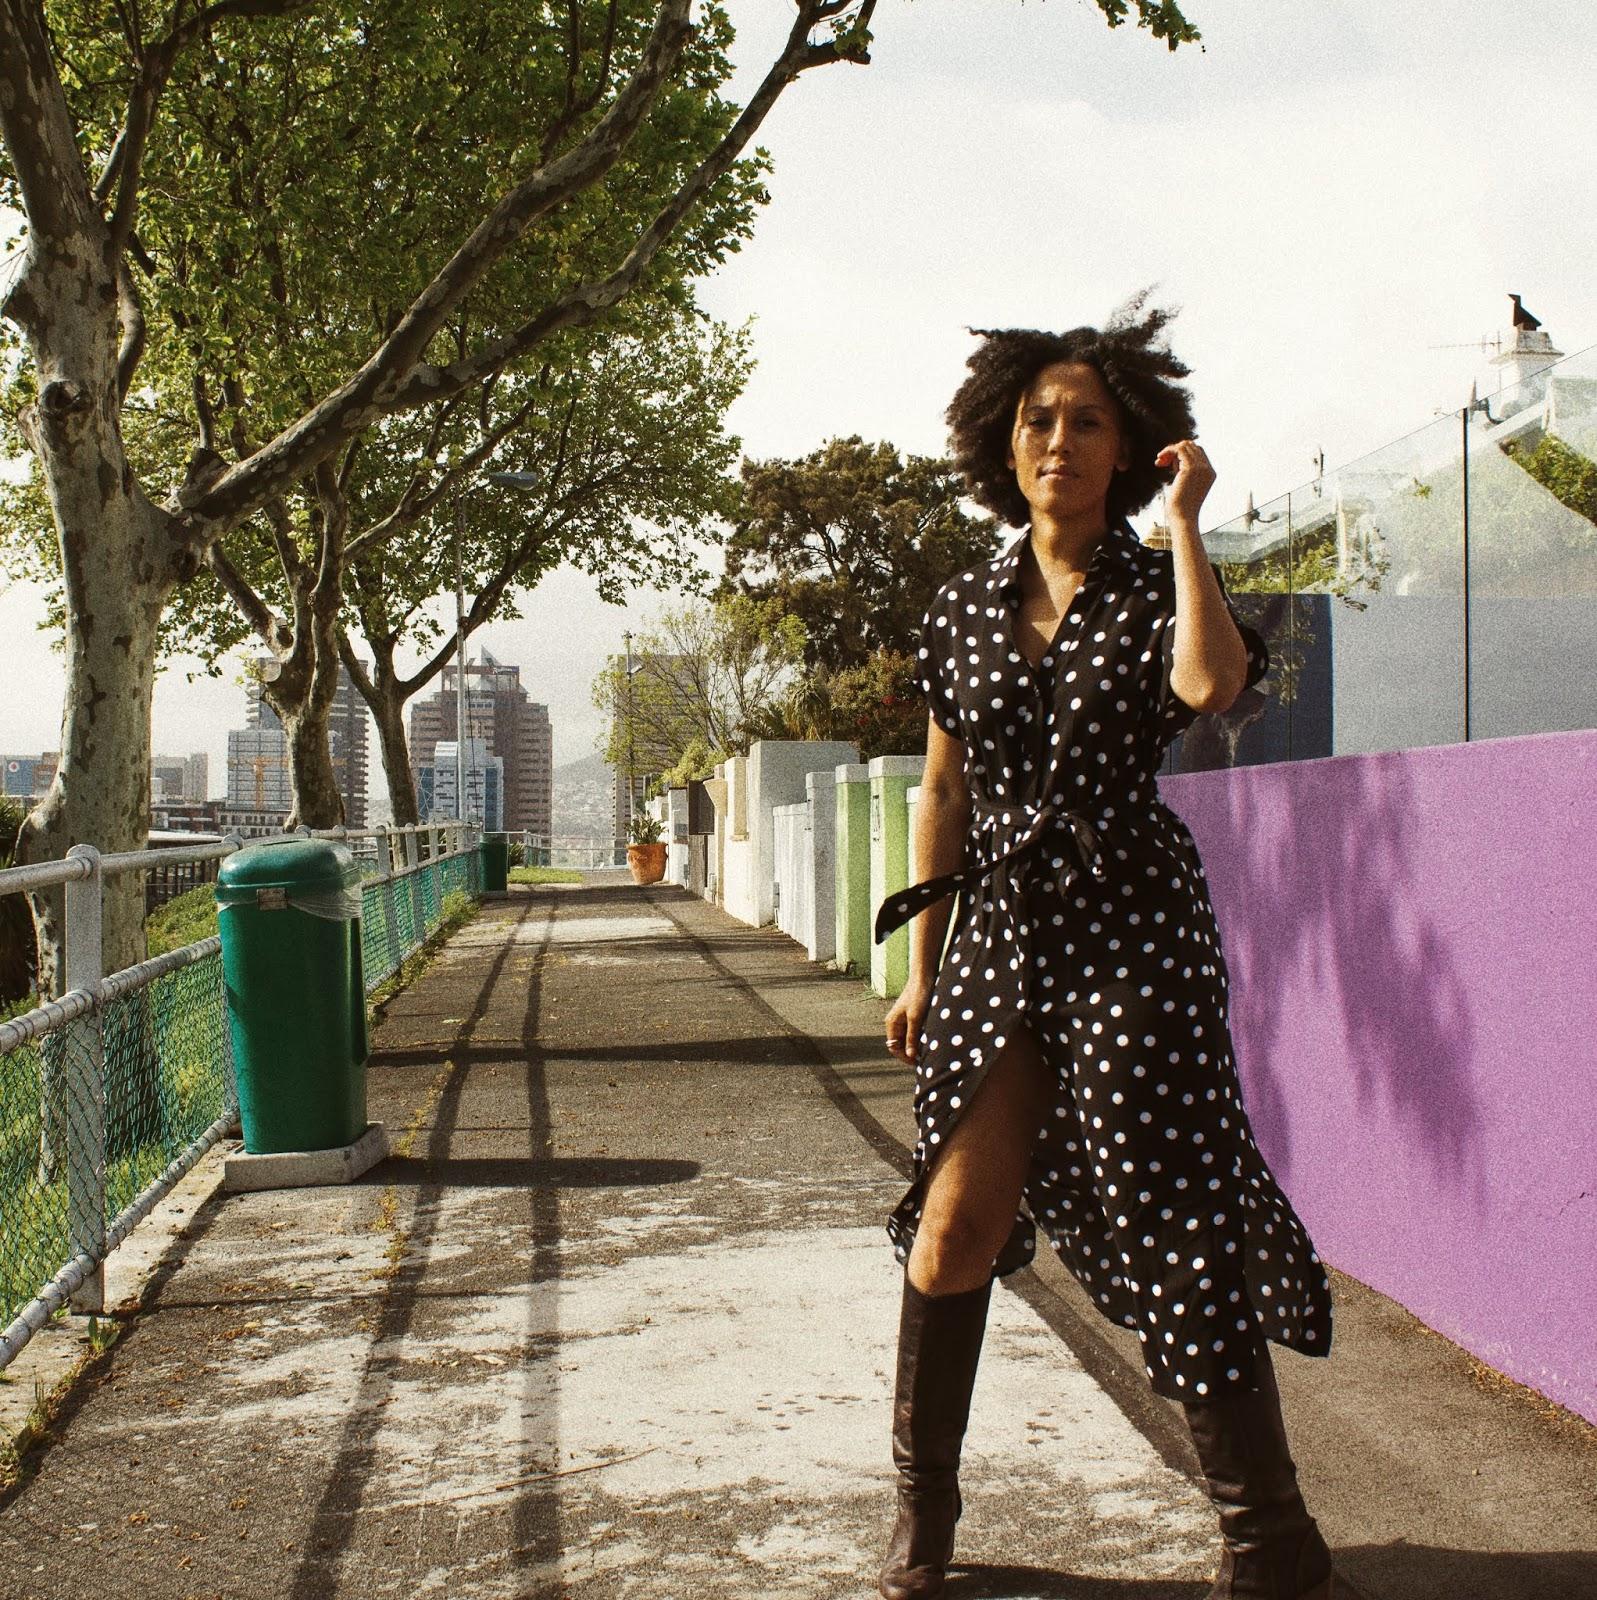 Liezel-Esquire-how-to-wear-polka-dot-dress